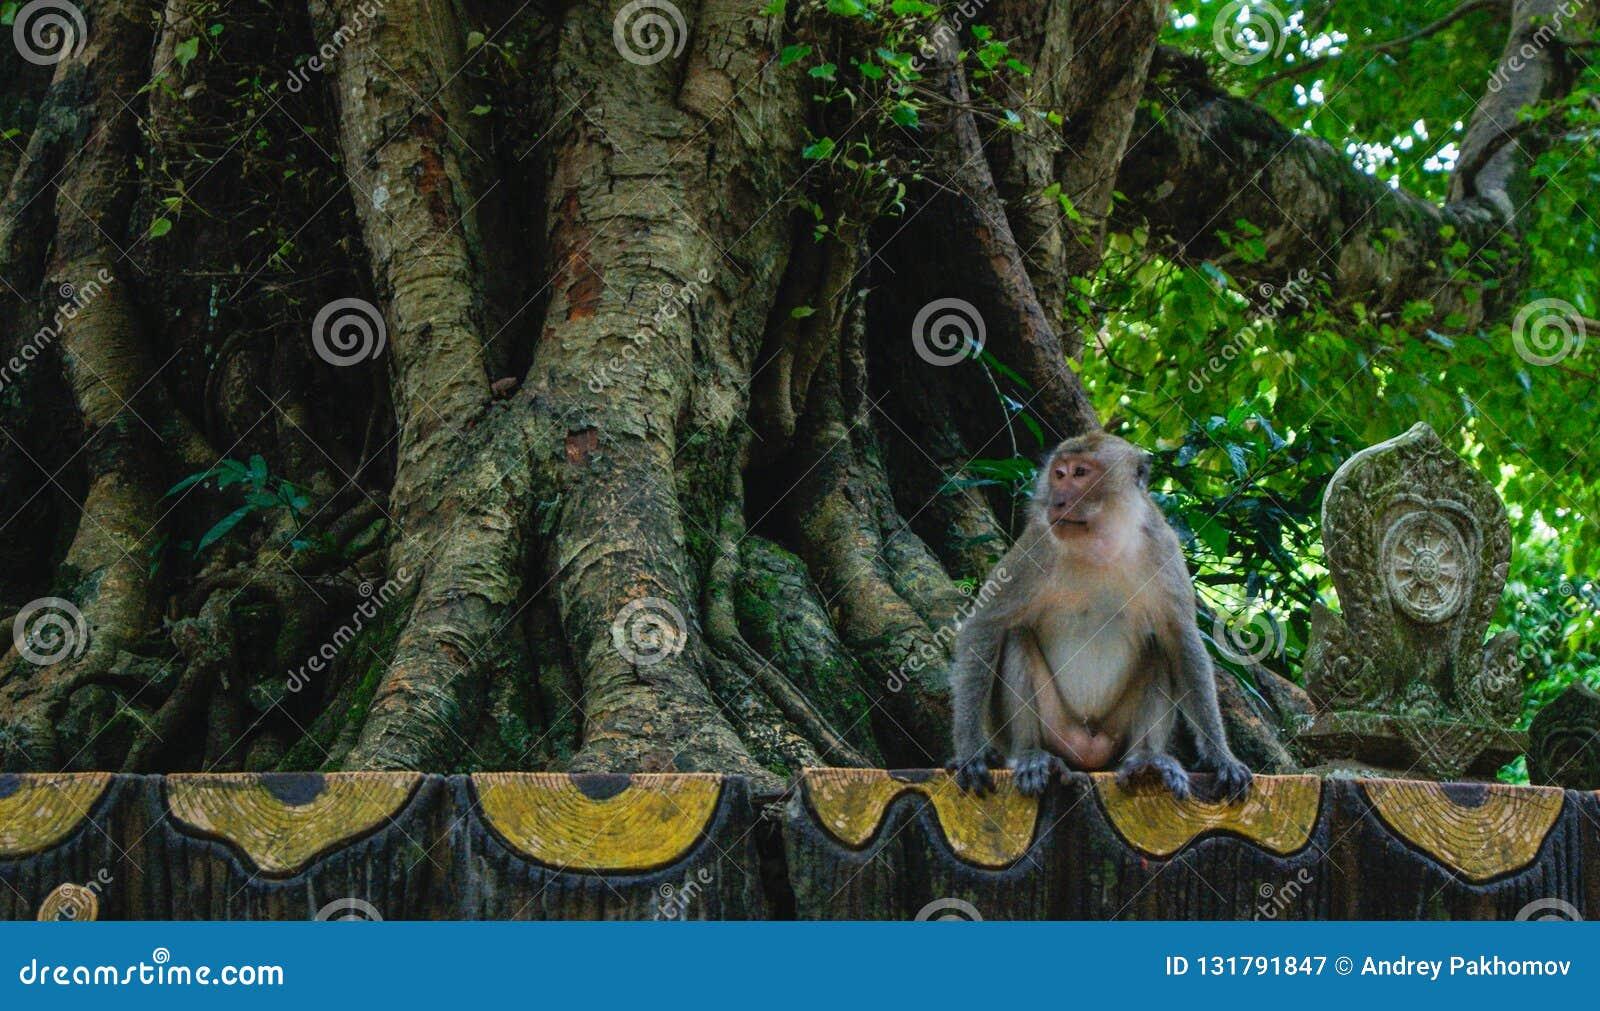 Sad Abandoned Monkey Sitting On The Side Of The Road